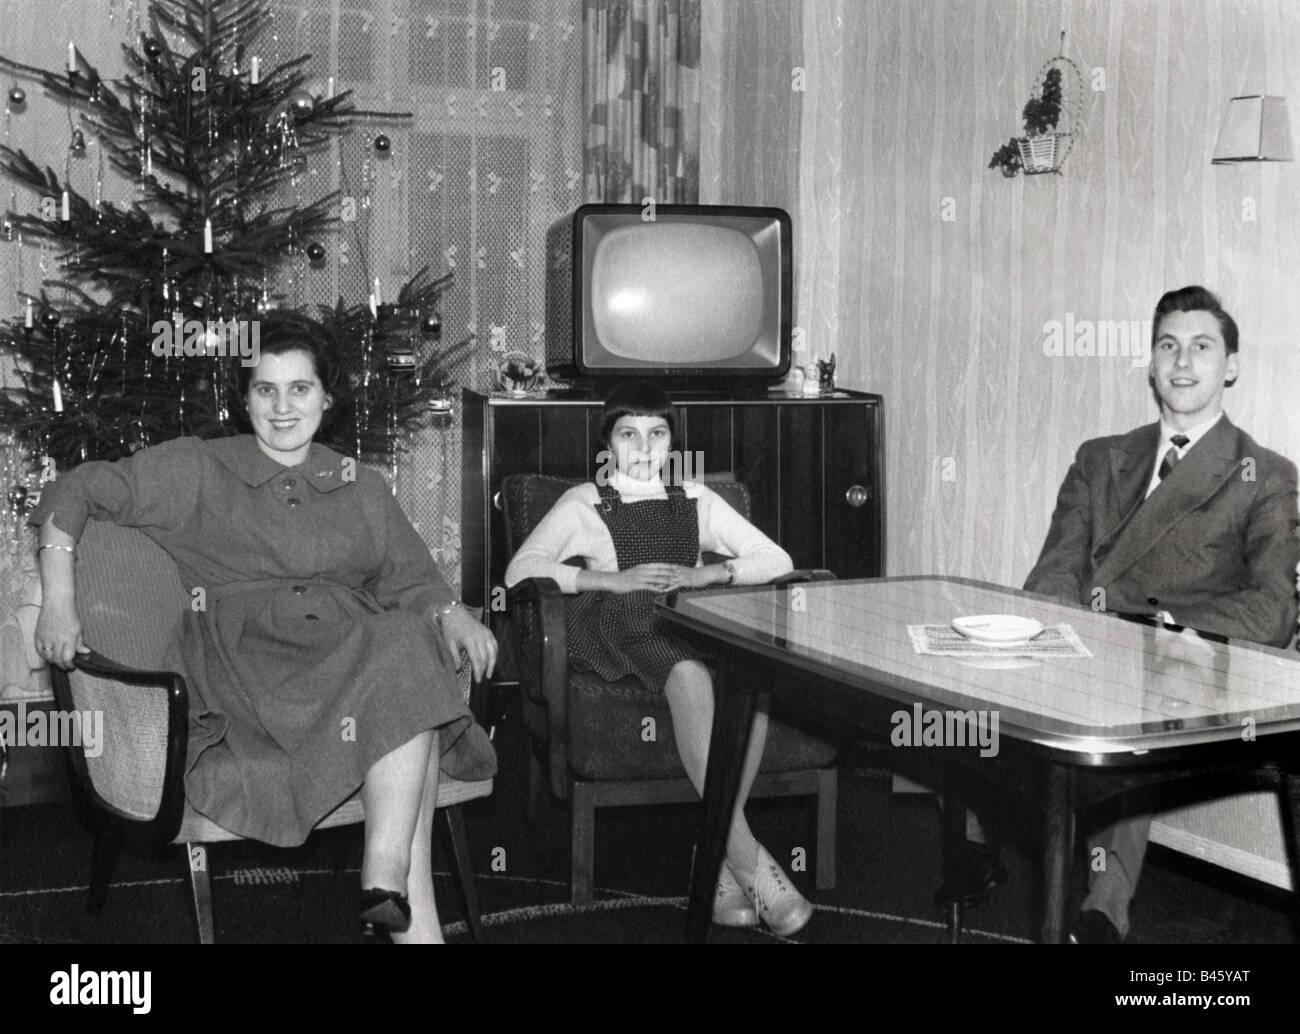 1950s Family Living Room Stock Photos  1950s Family